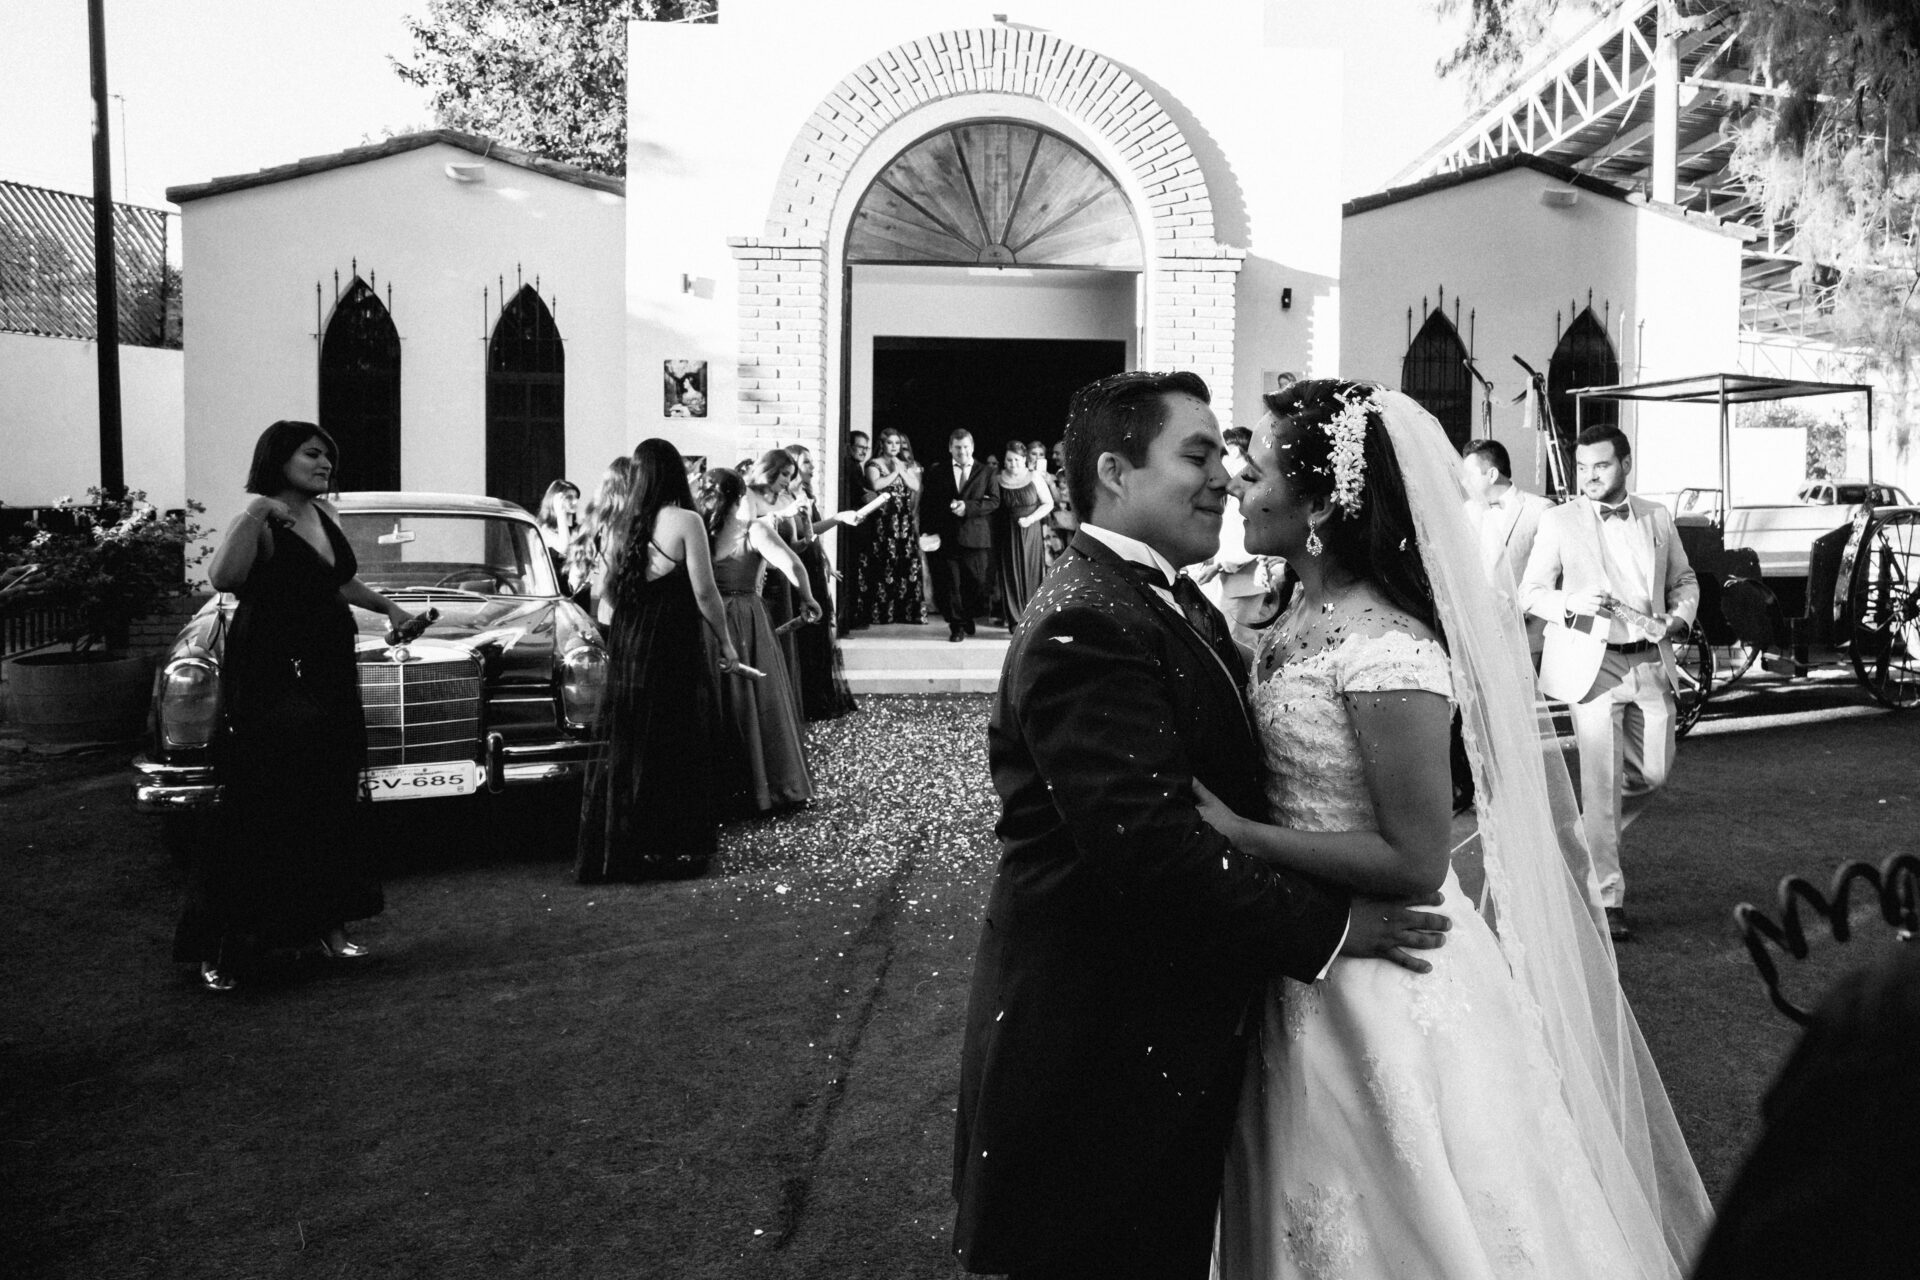 javier_noriega_fotografo_bodas_torreon_coahuila_zacatecas_wedding_photographer35a